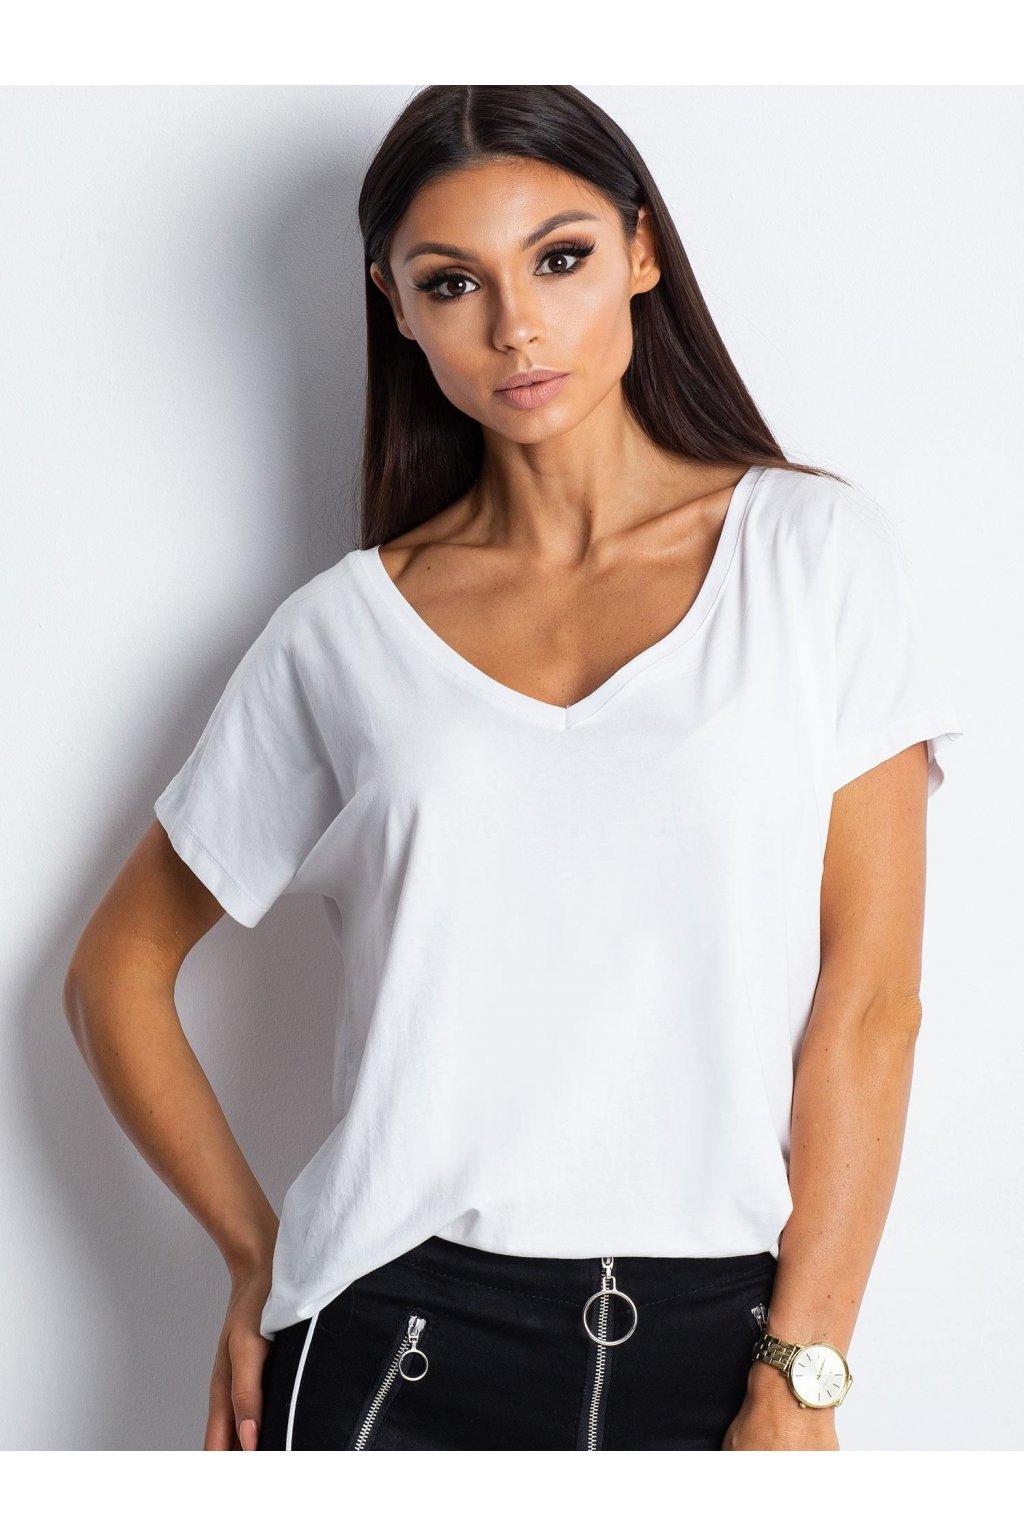 pol pl Bialy t shirt Emory 320848 1